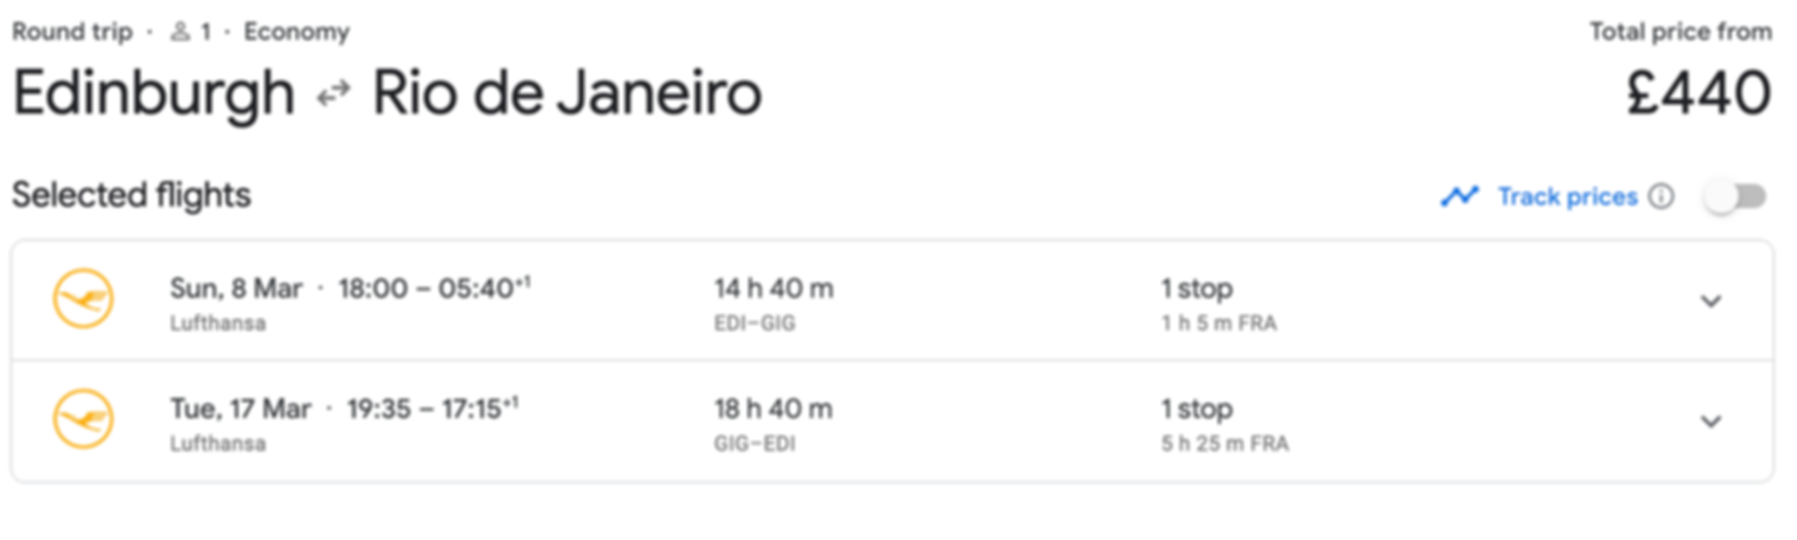 Rio De Janeiro from Birmingham, Manchester or Edinburgh for £439 RTN